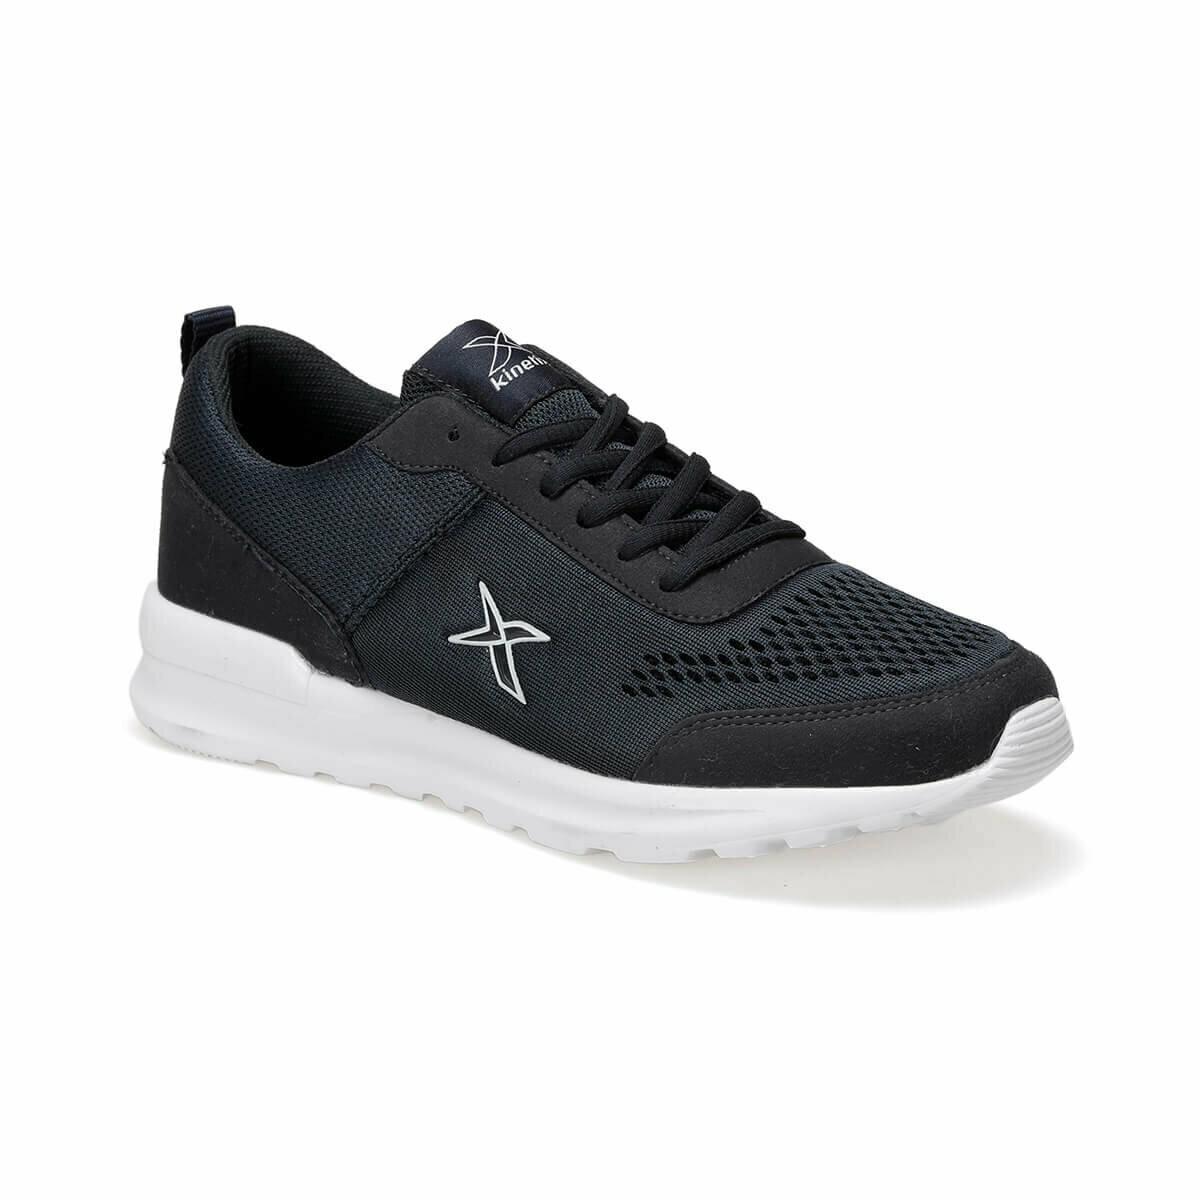 FLO BELEN M Navy Blue Men 'S Sneaker Shoes KINETIX